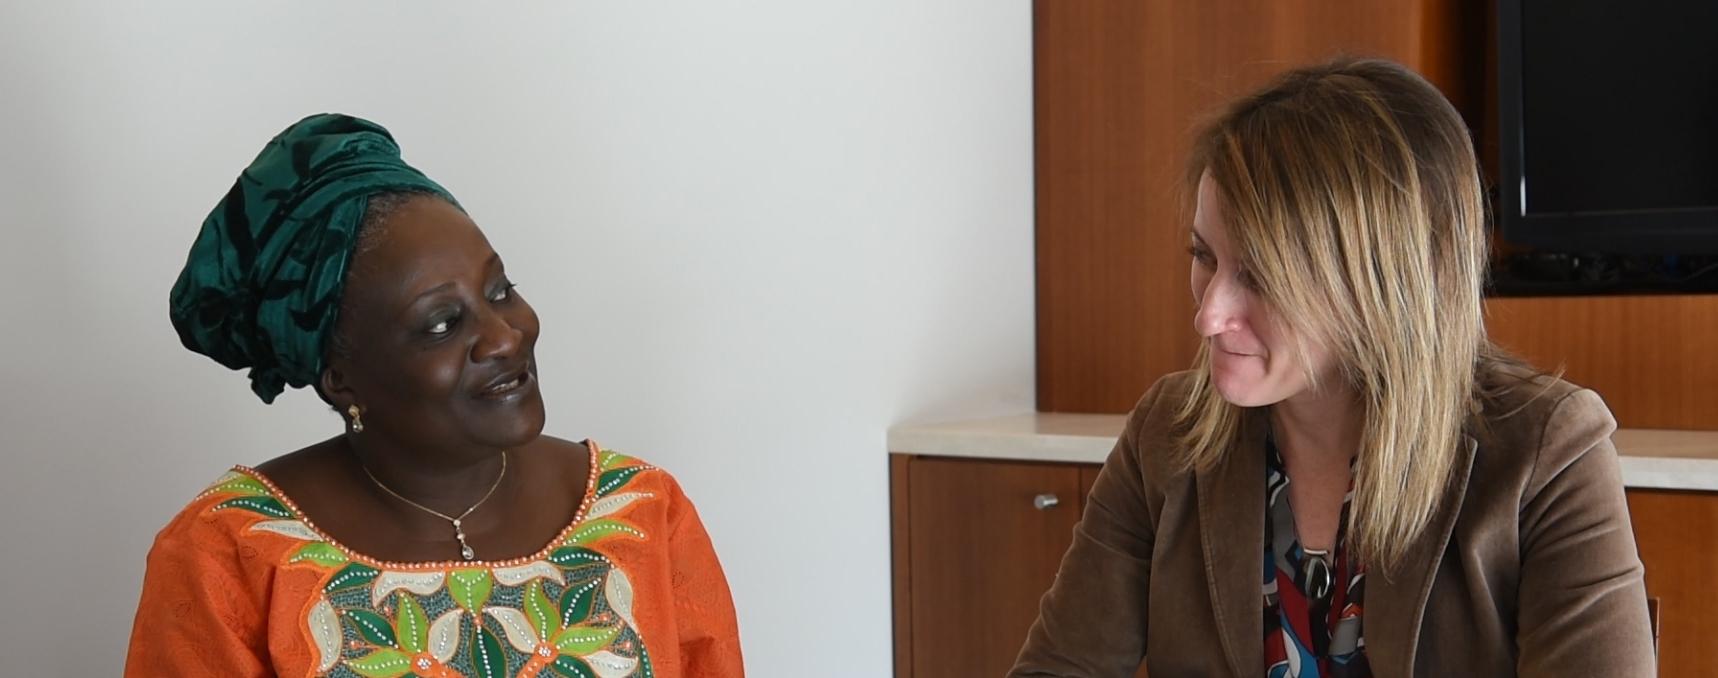 Pastor Ibanga and Susie Hayward